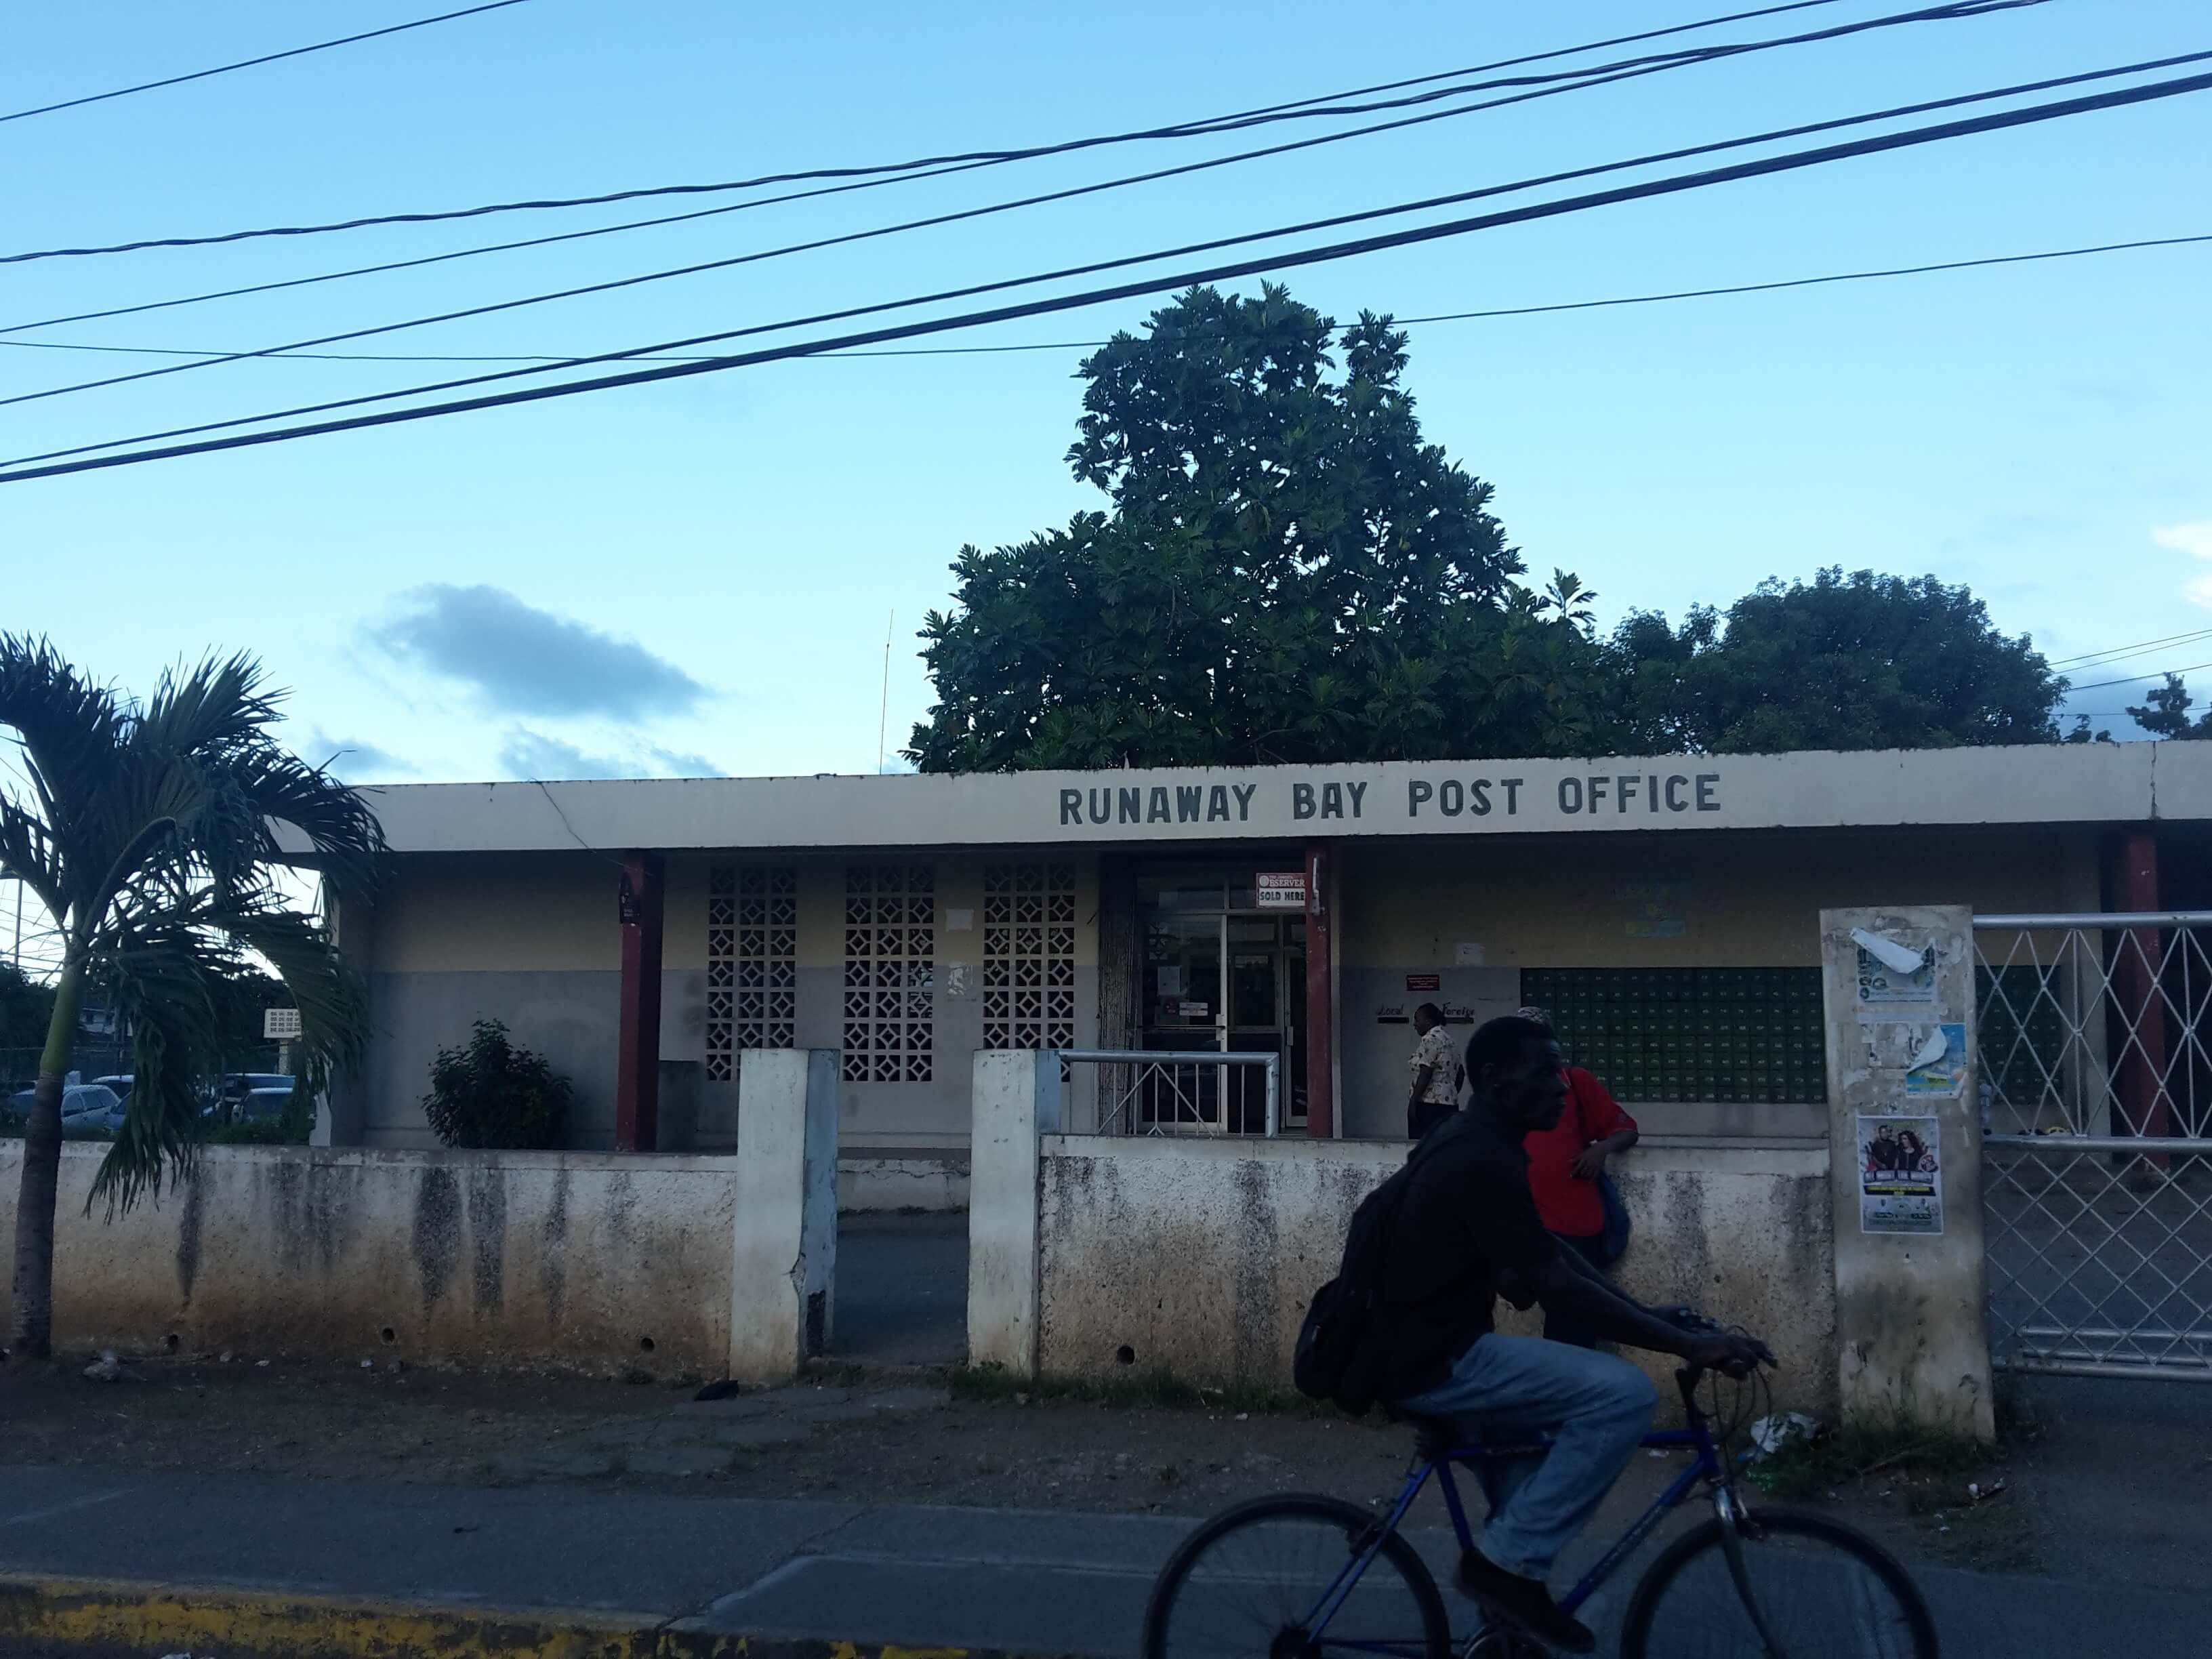 runaway_bay_post_office